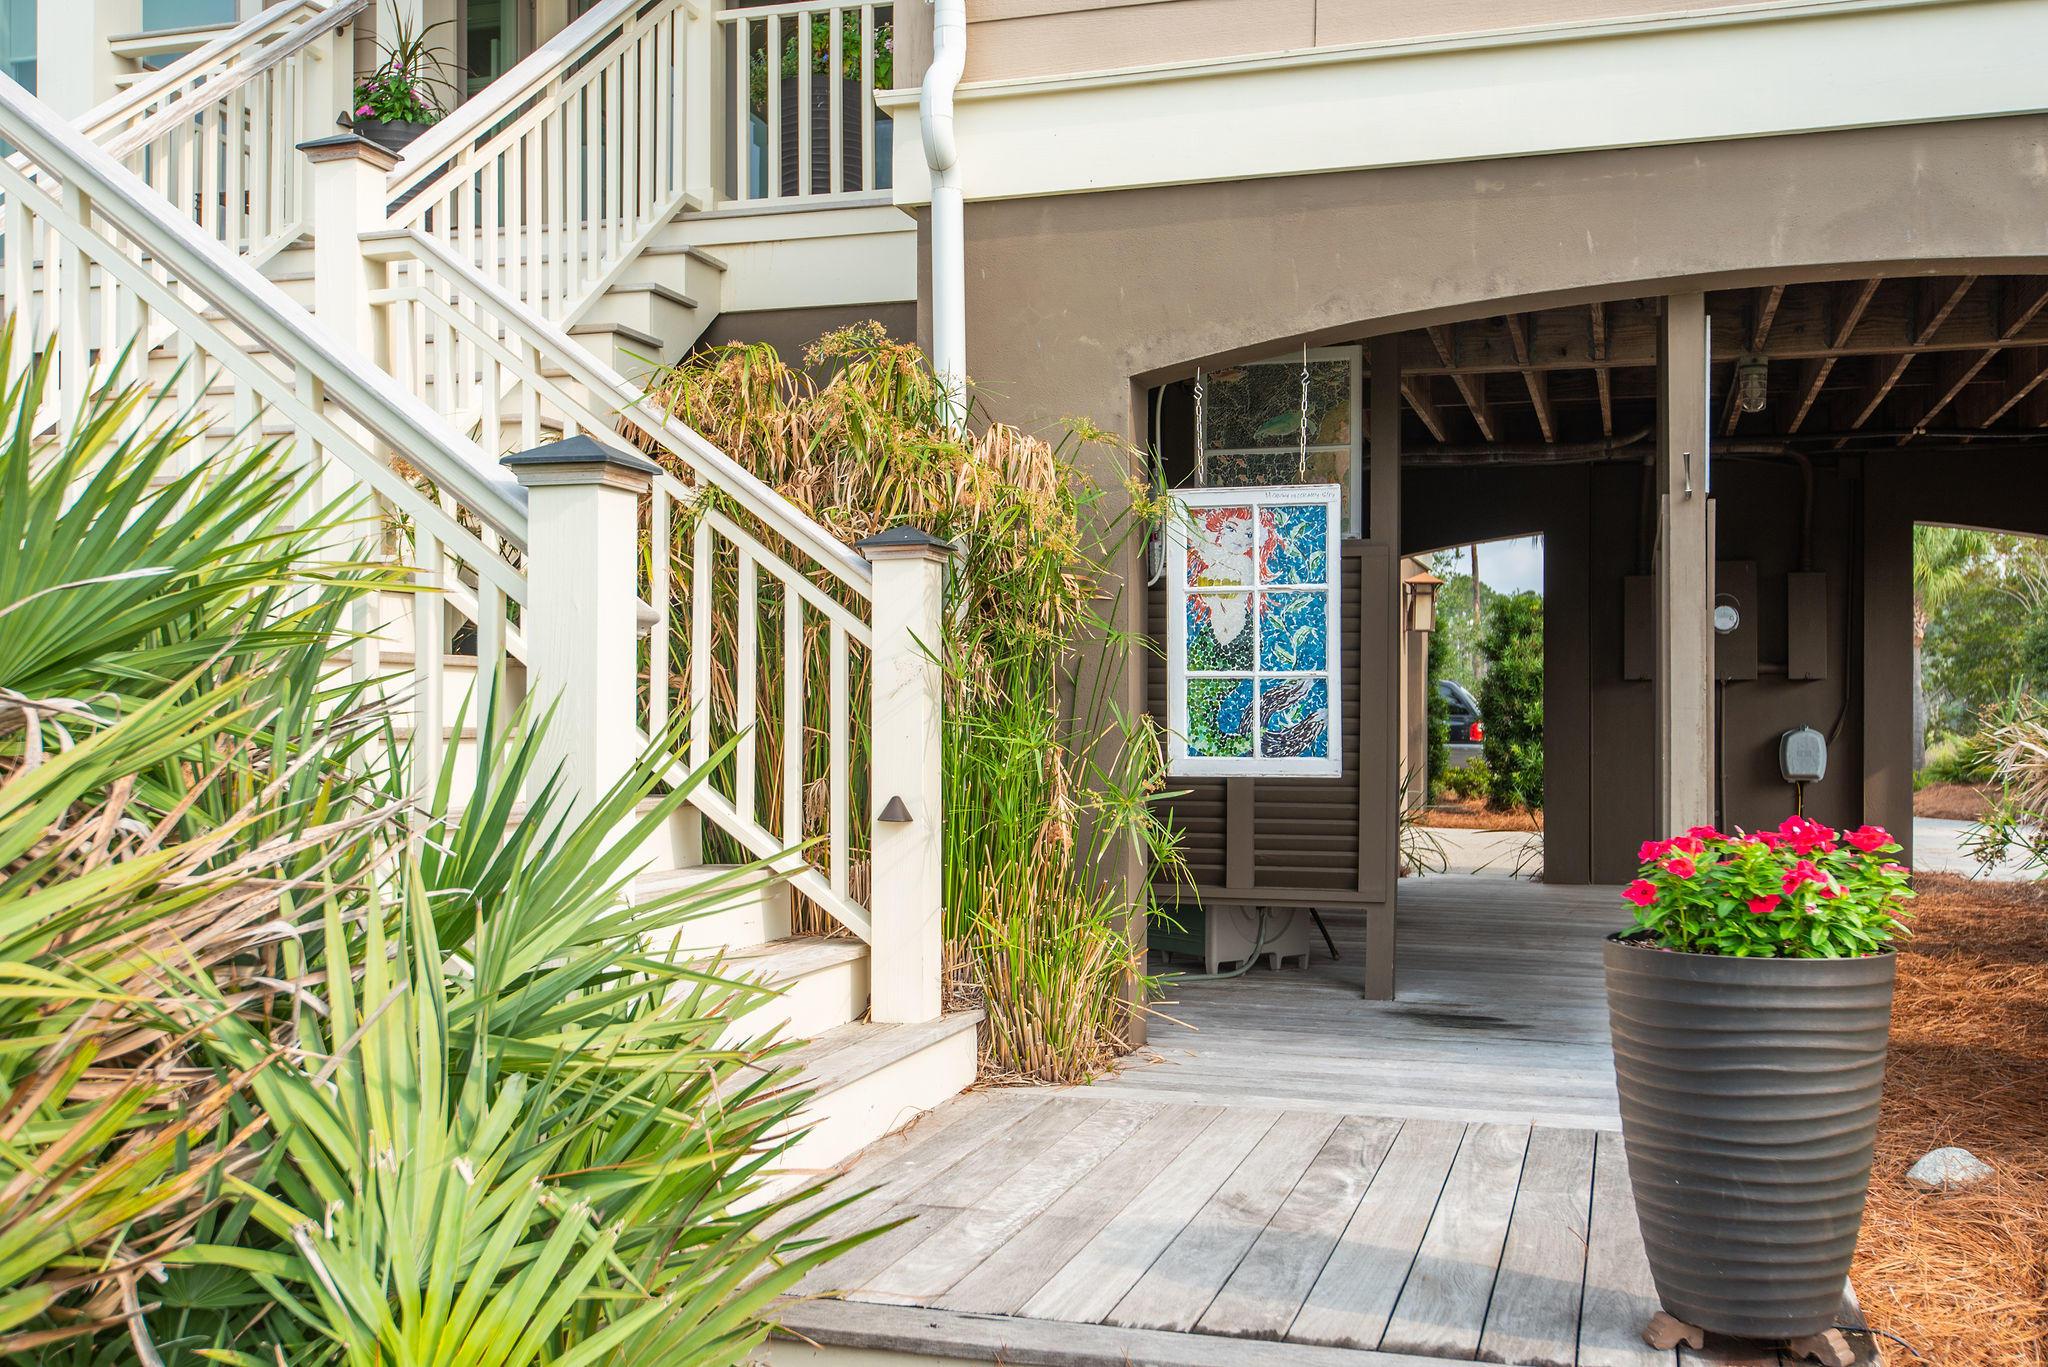 Seabrook Island Homes For Sale - 3135 Marshgate, Seabrook Island, SC - 20